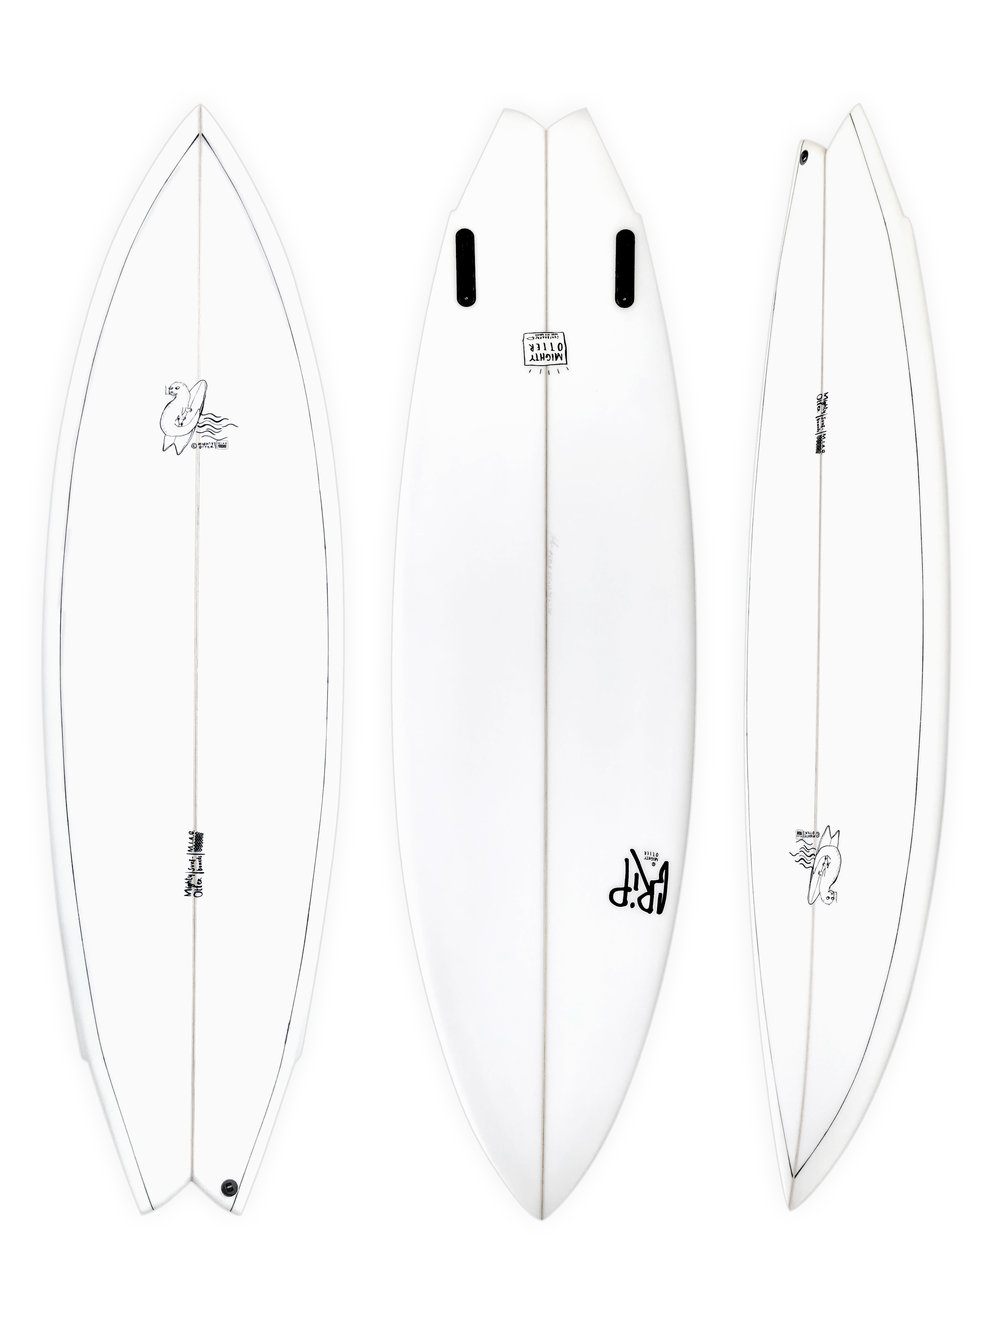 MightyOtterSurfboards_GRip_Quirn_Rohleder_Twin_Fin_Surfboard.jpg